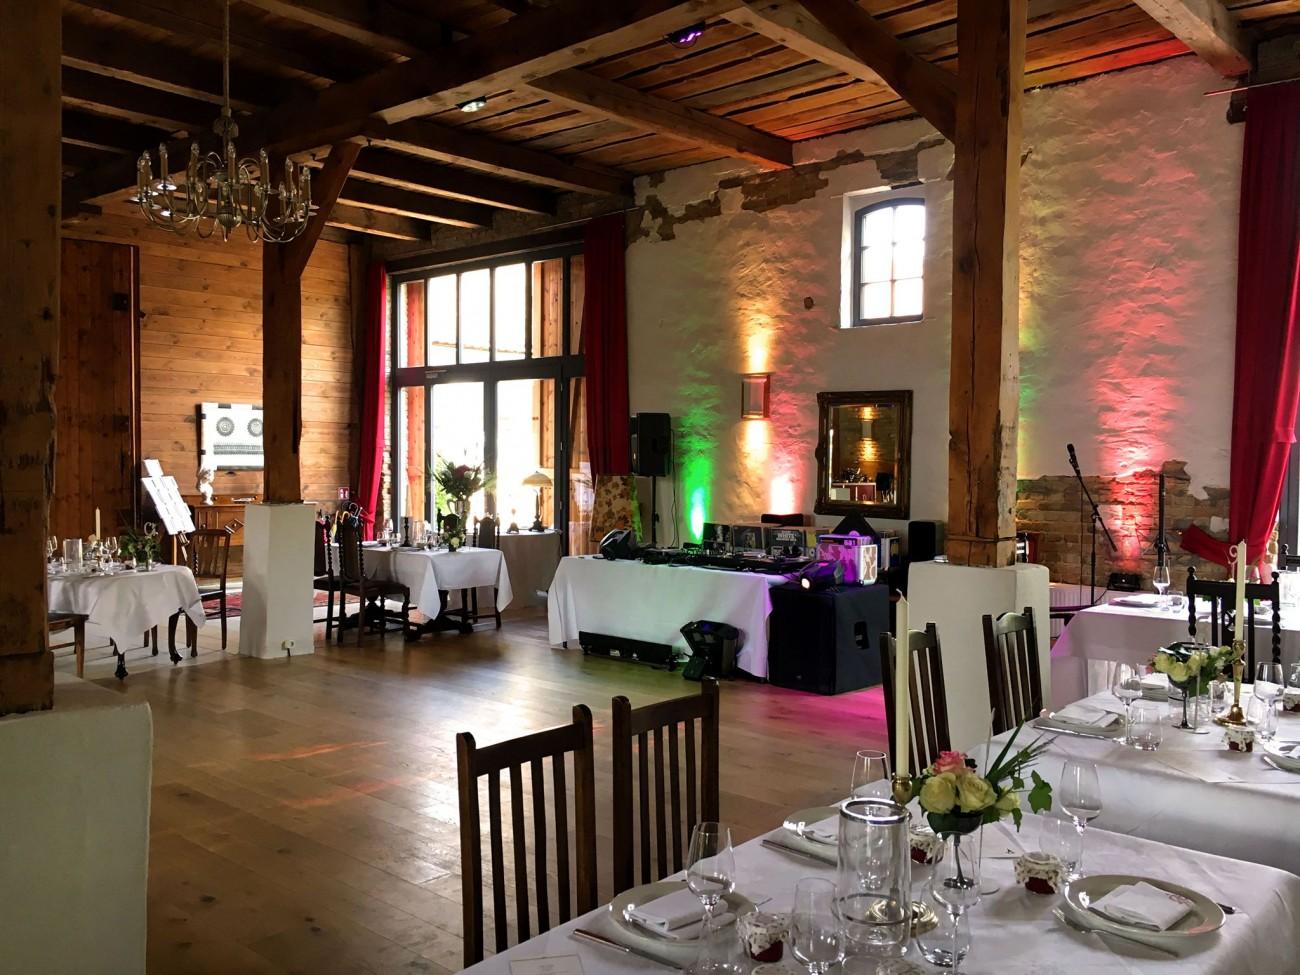 Hochzeits Dj Bochum Dj In Bochum Buchen Musik Fur Ihre Hochzeit In Bochum Hochzeits Dj Aus Bochum Dj In Bochum Mieten Dj Fur Ihre Hochzeit Geburtstag Party In Bochum Schonste Hochzeitslocations In Bochum